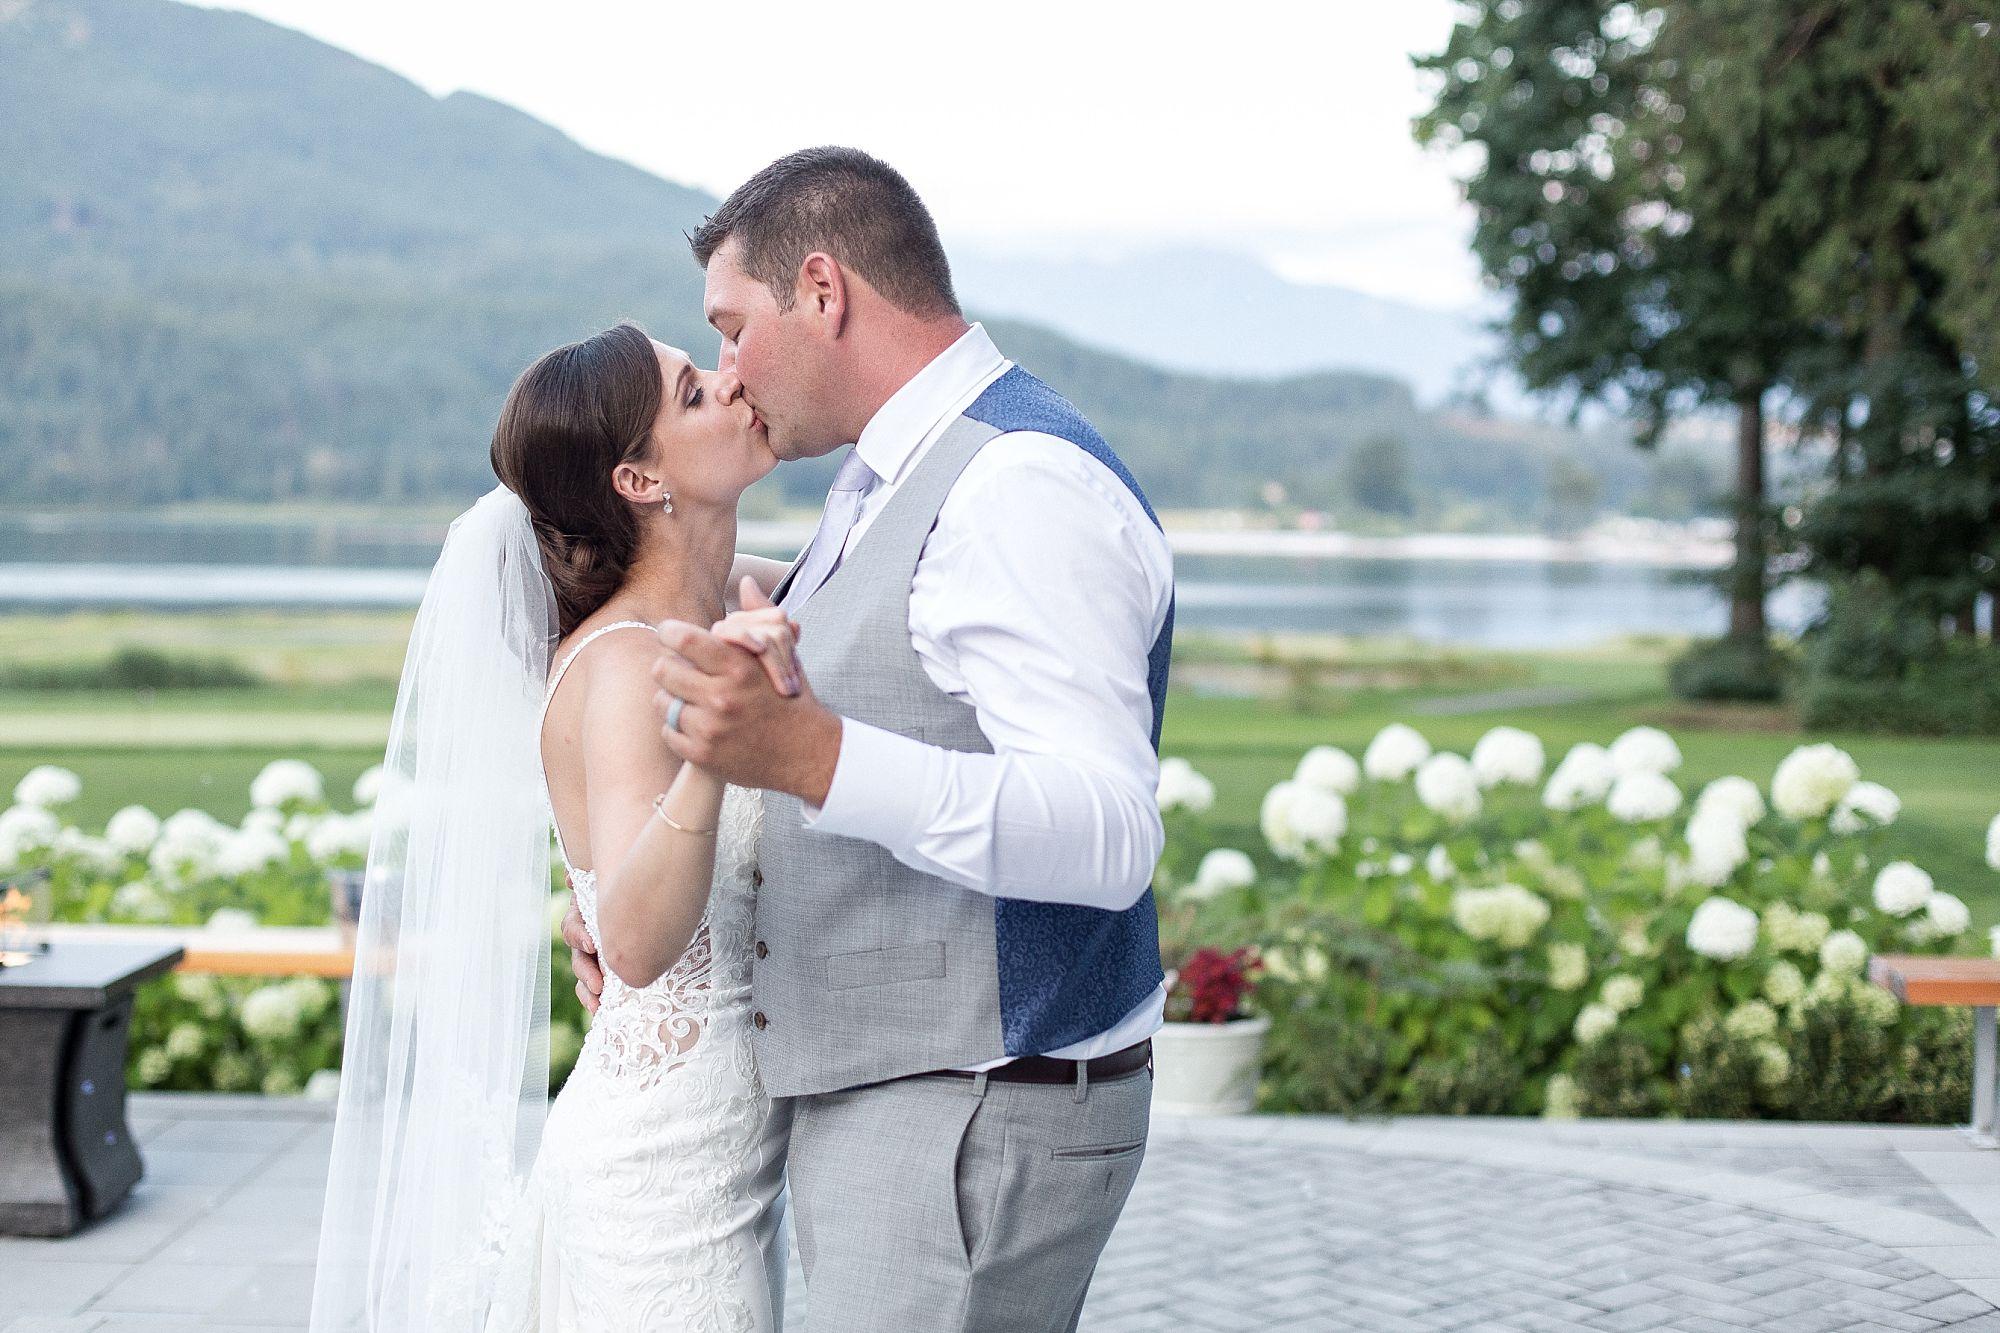 Vancouver Wedding Photography Hayley Rae Photography Associate_0014.jpg